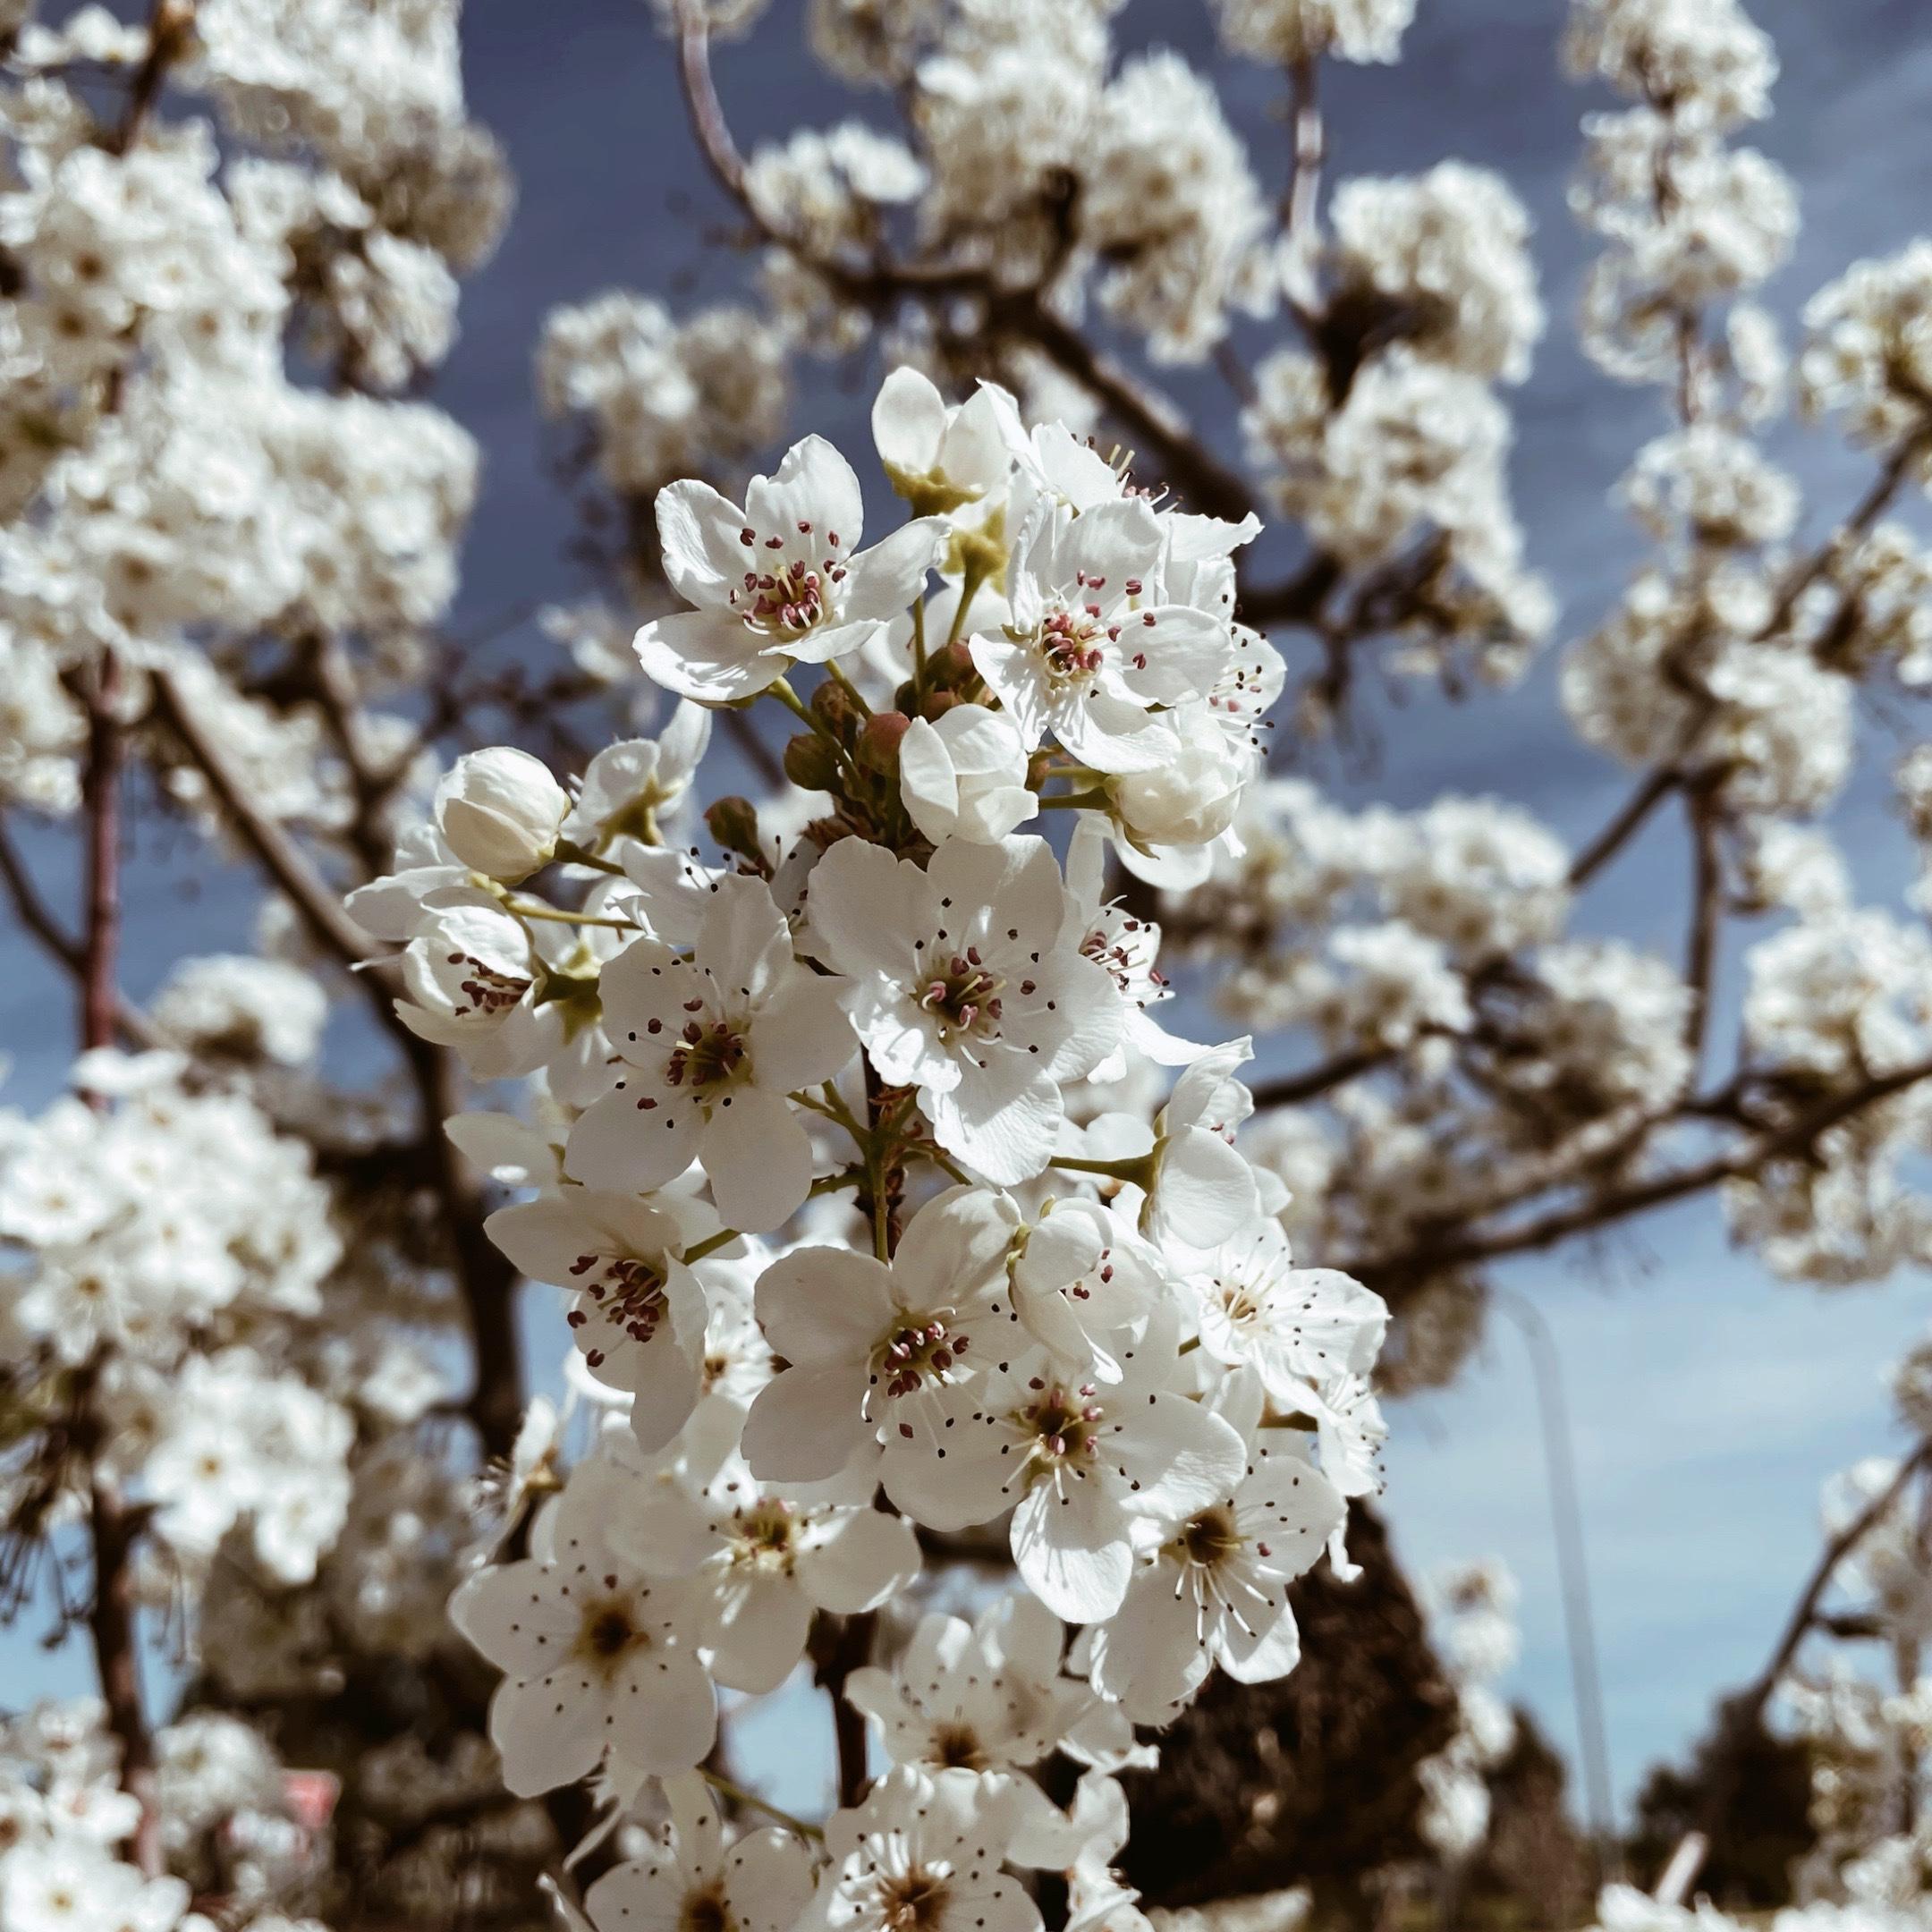 White spring blossom on a tree.